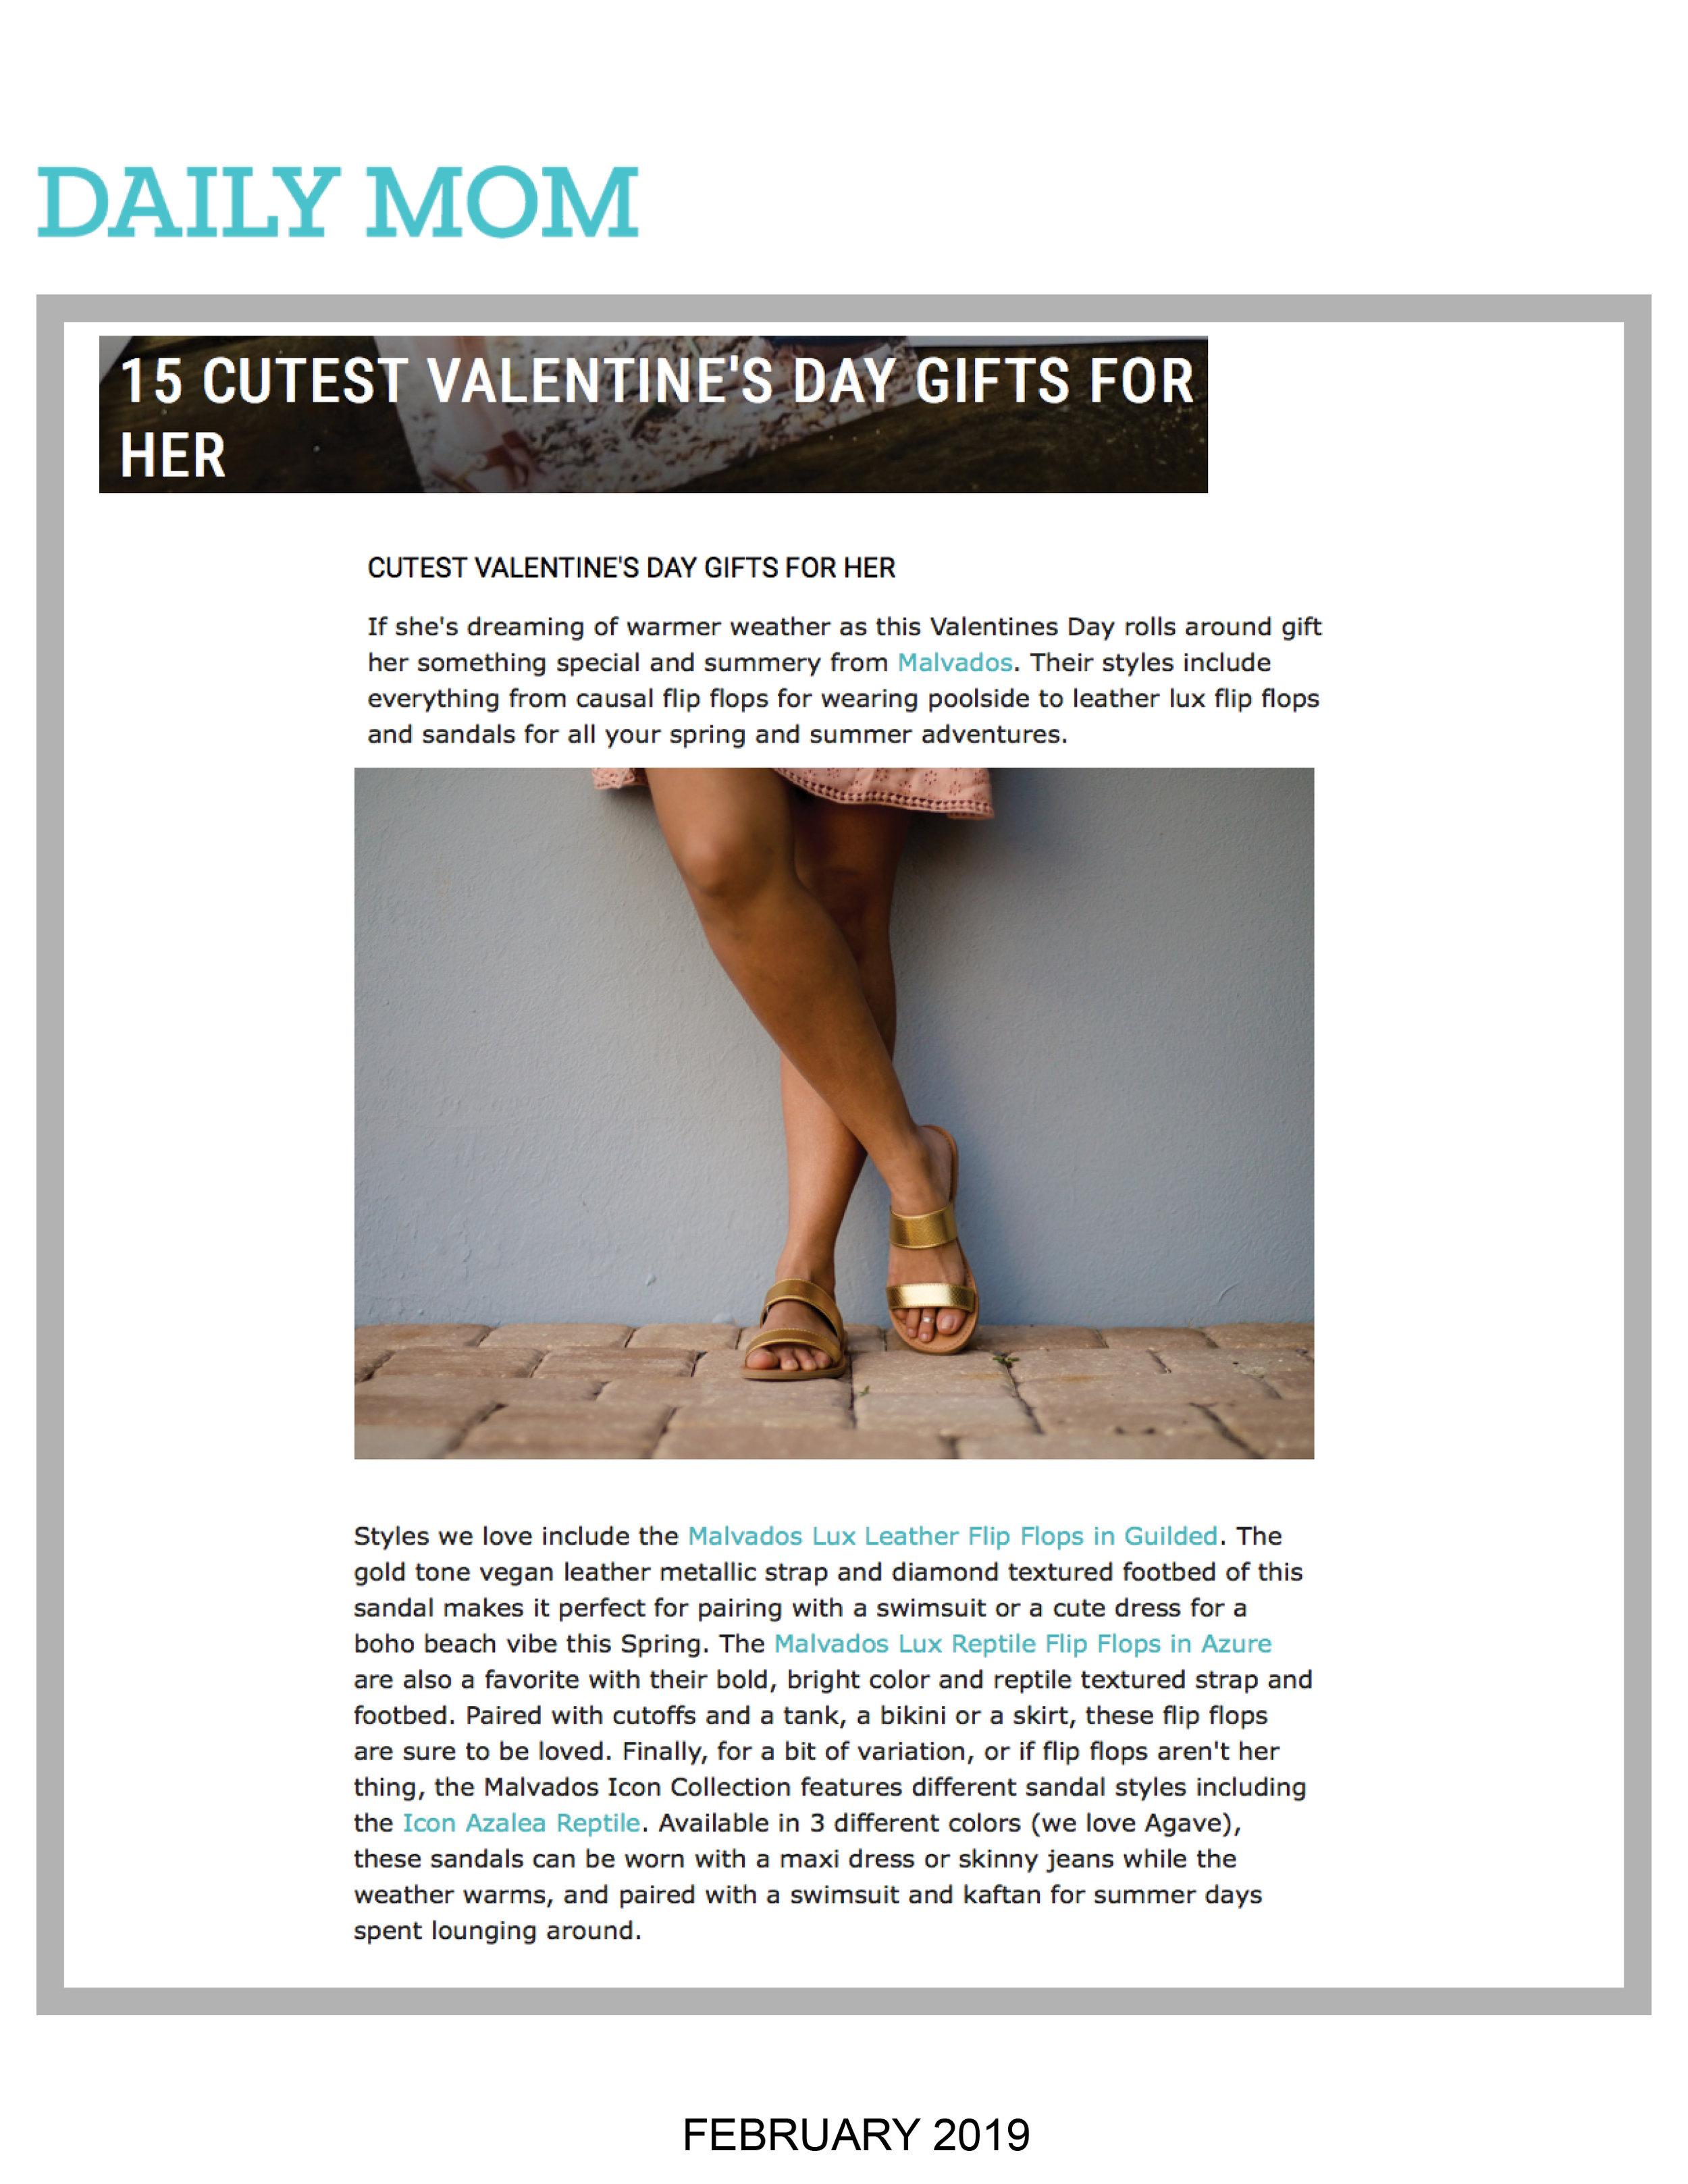 Malvados_DailyMom_February2019.jpg